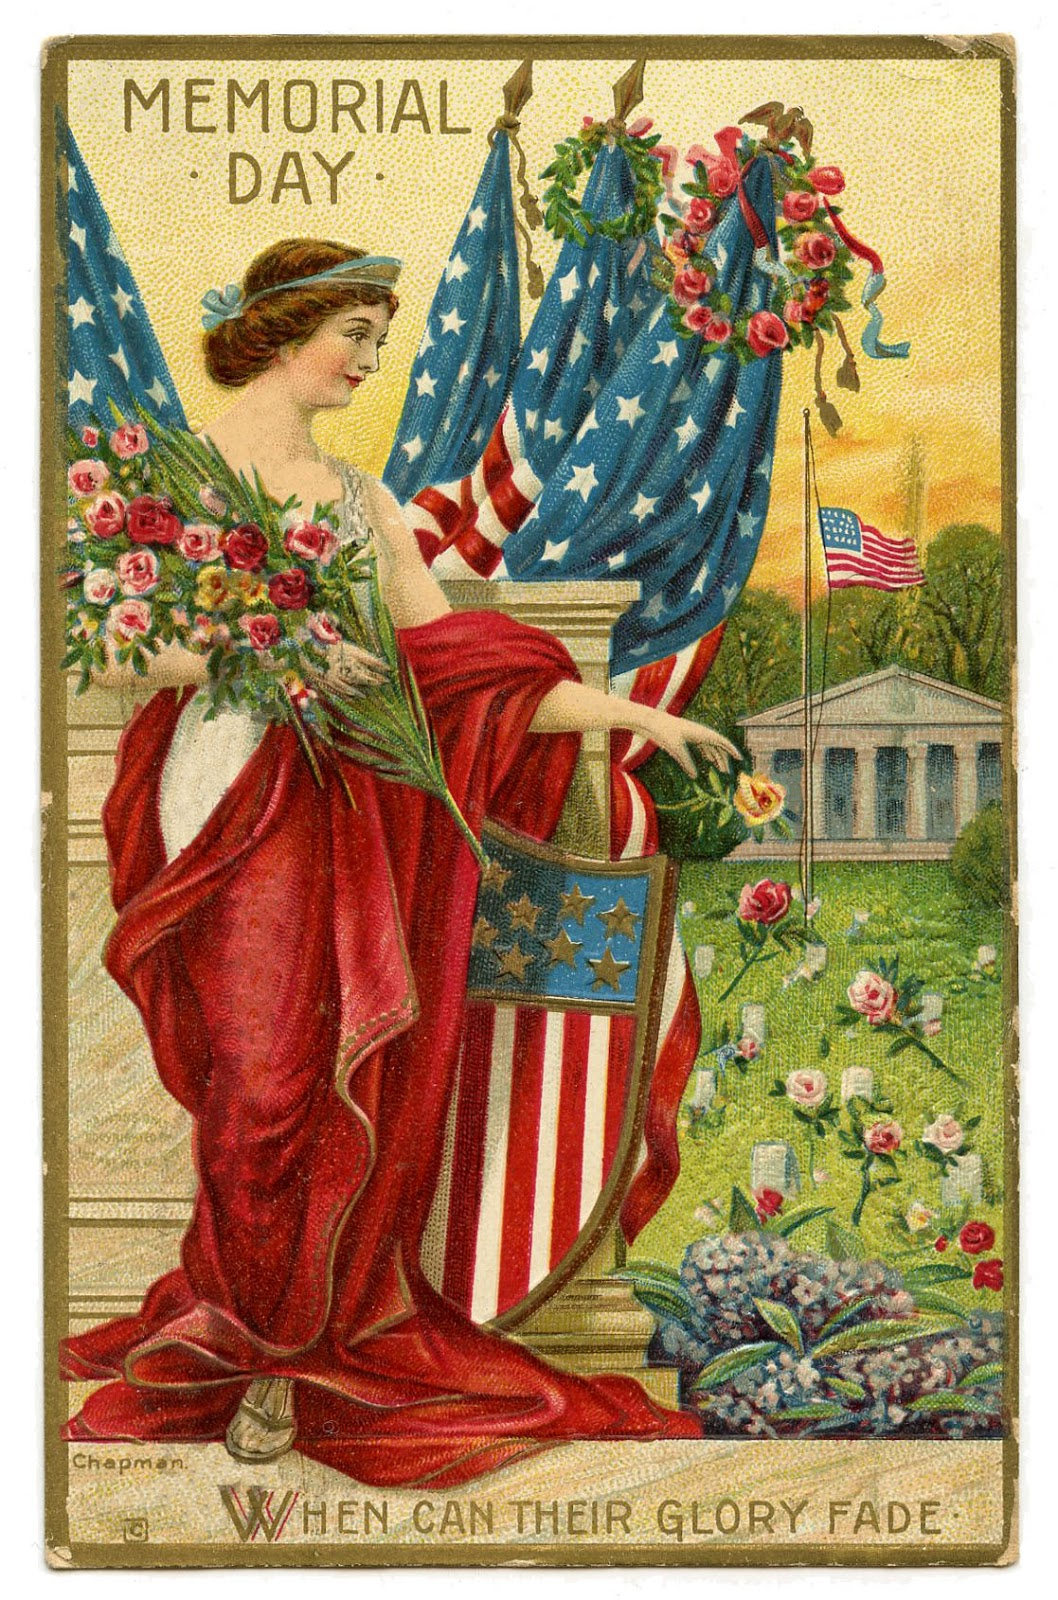 Memorial-Day-Vintage-Postcard-GraphicsFairy1.jpg